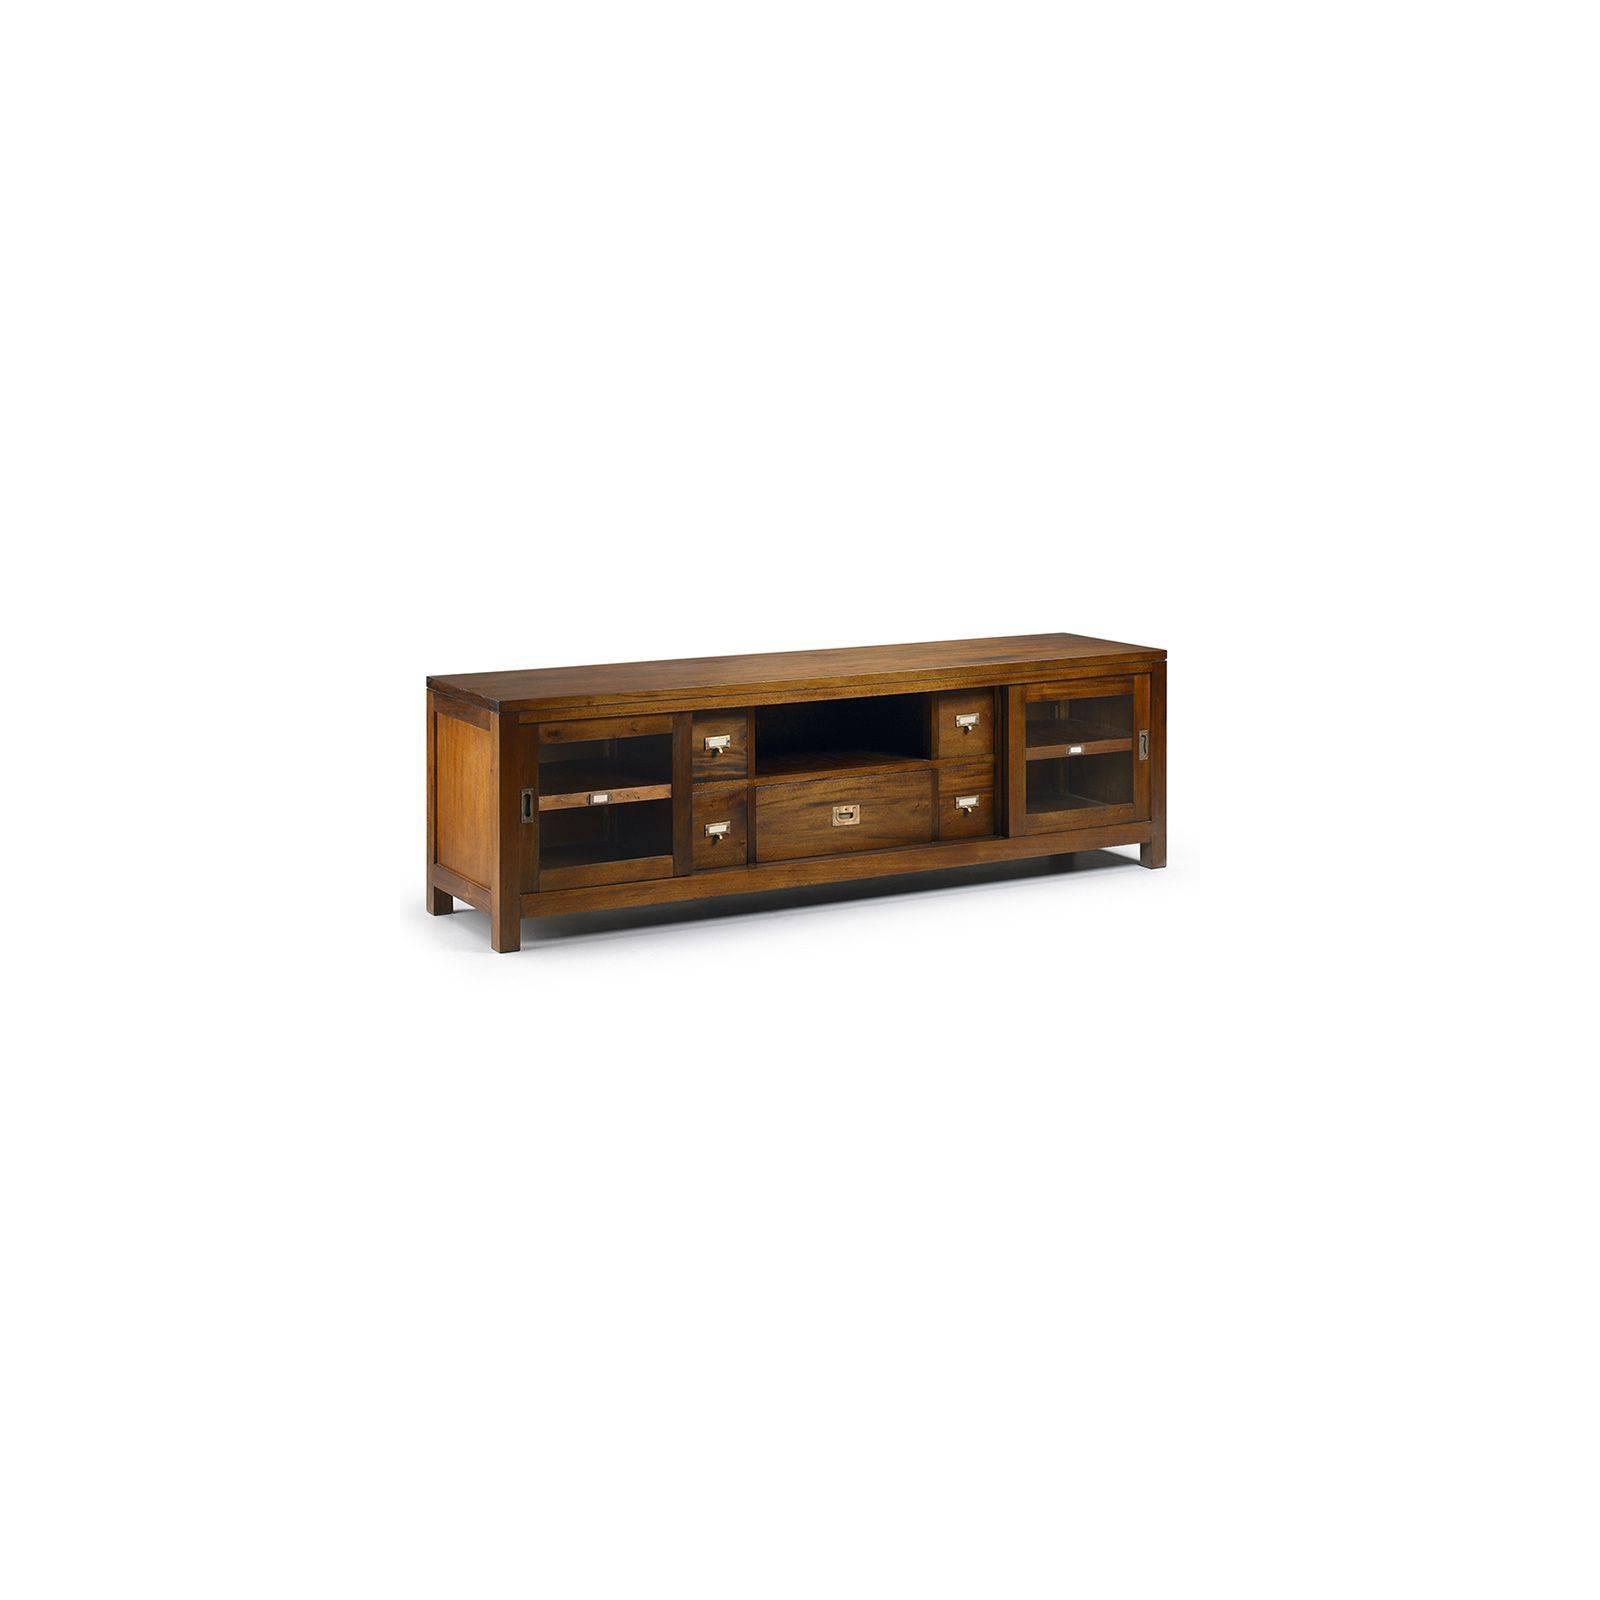 Meuble Tv GM Colonial Acajou Massif - meuble tendance exotique